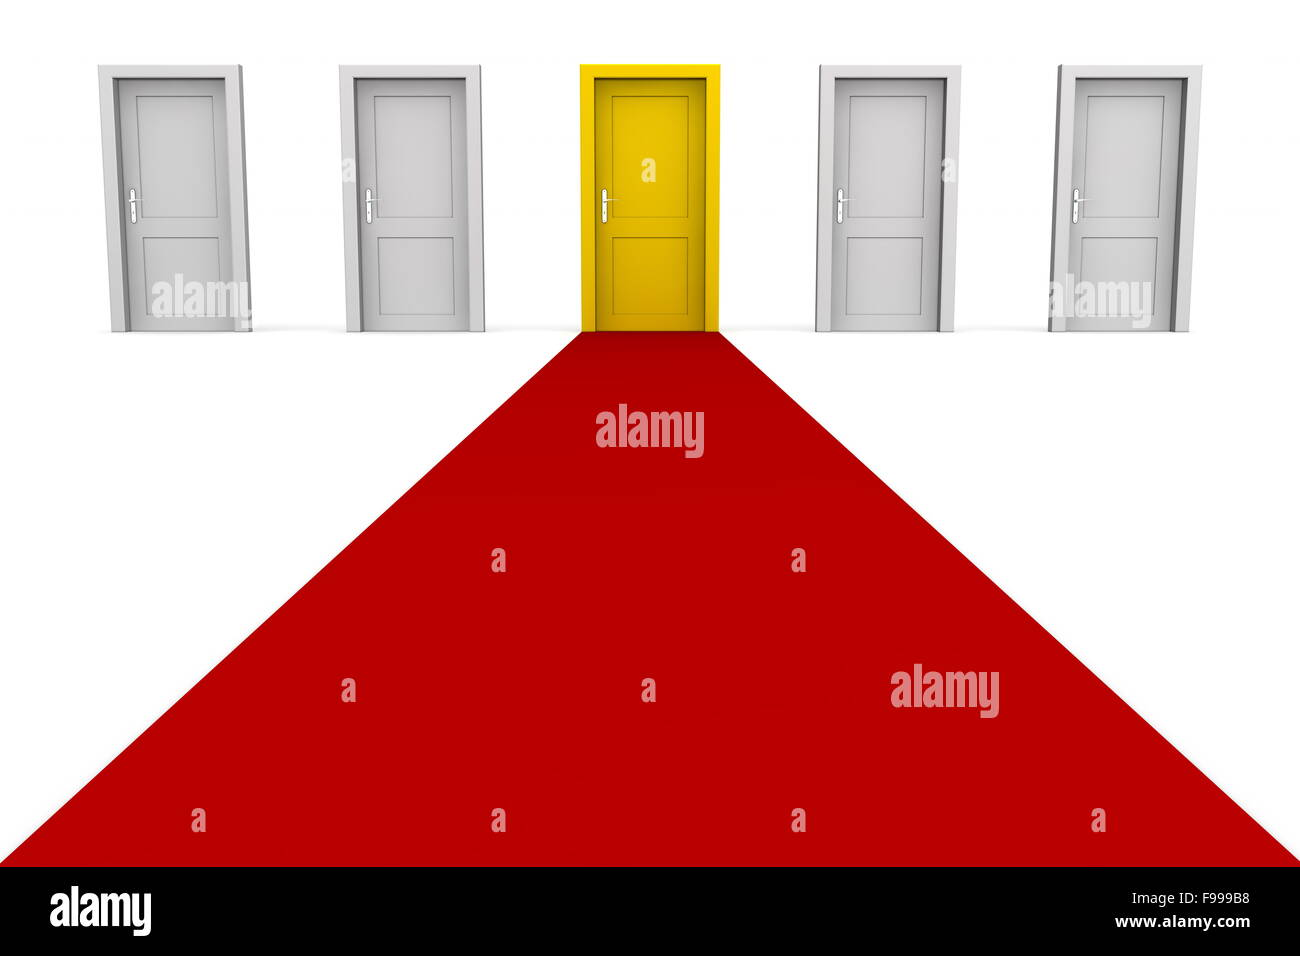 Cinq portes et un tapis rouge - jaune Photo Stock